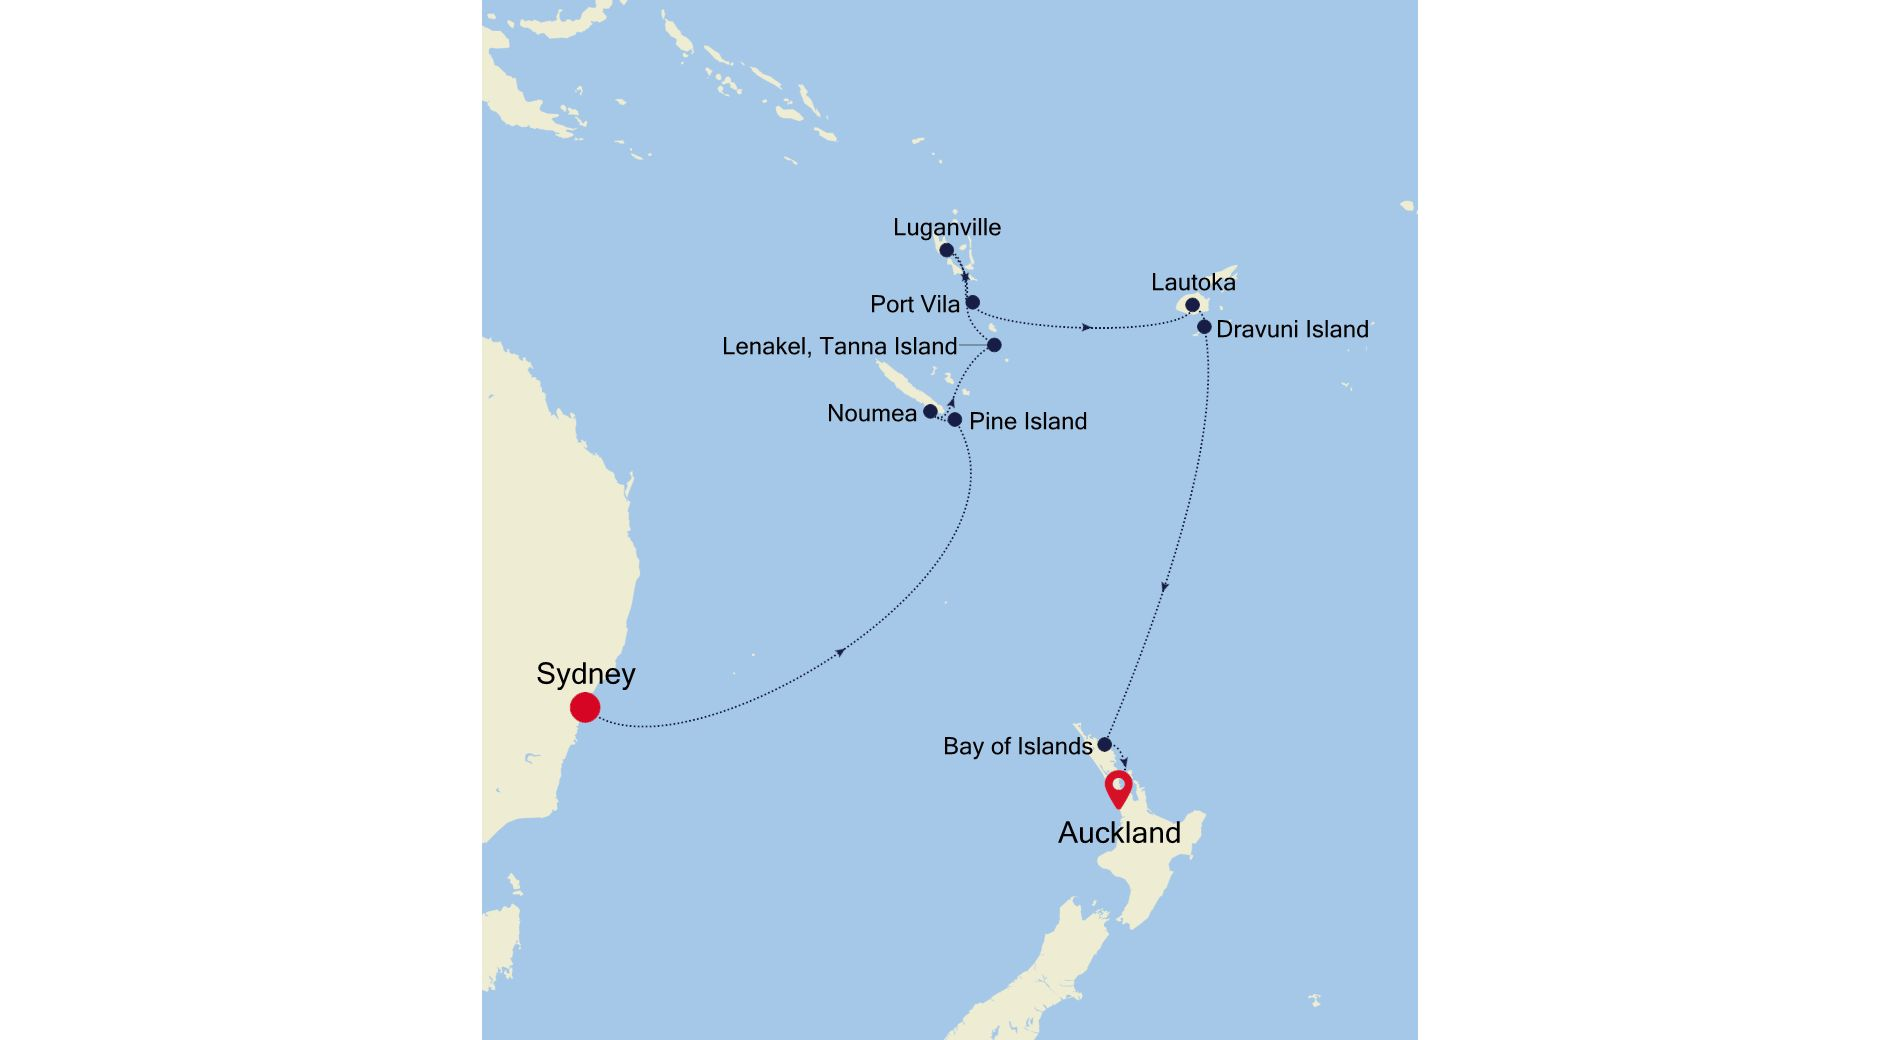 SM210119014 - Sydney to Auckland